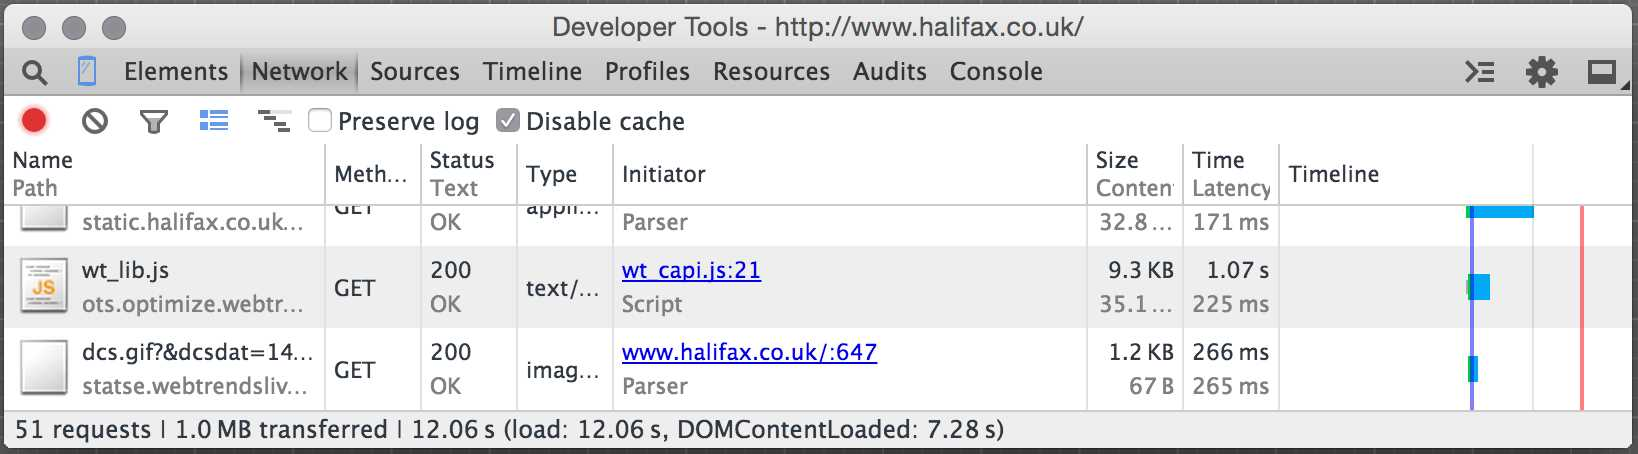 halifax load time 3g